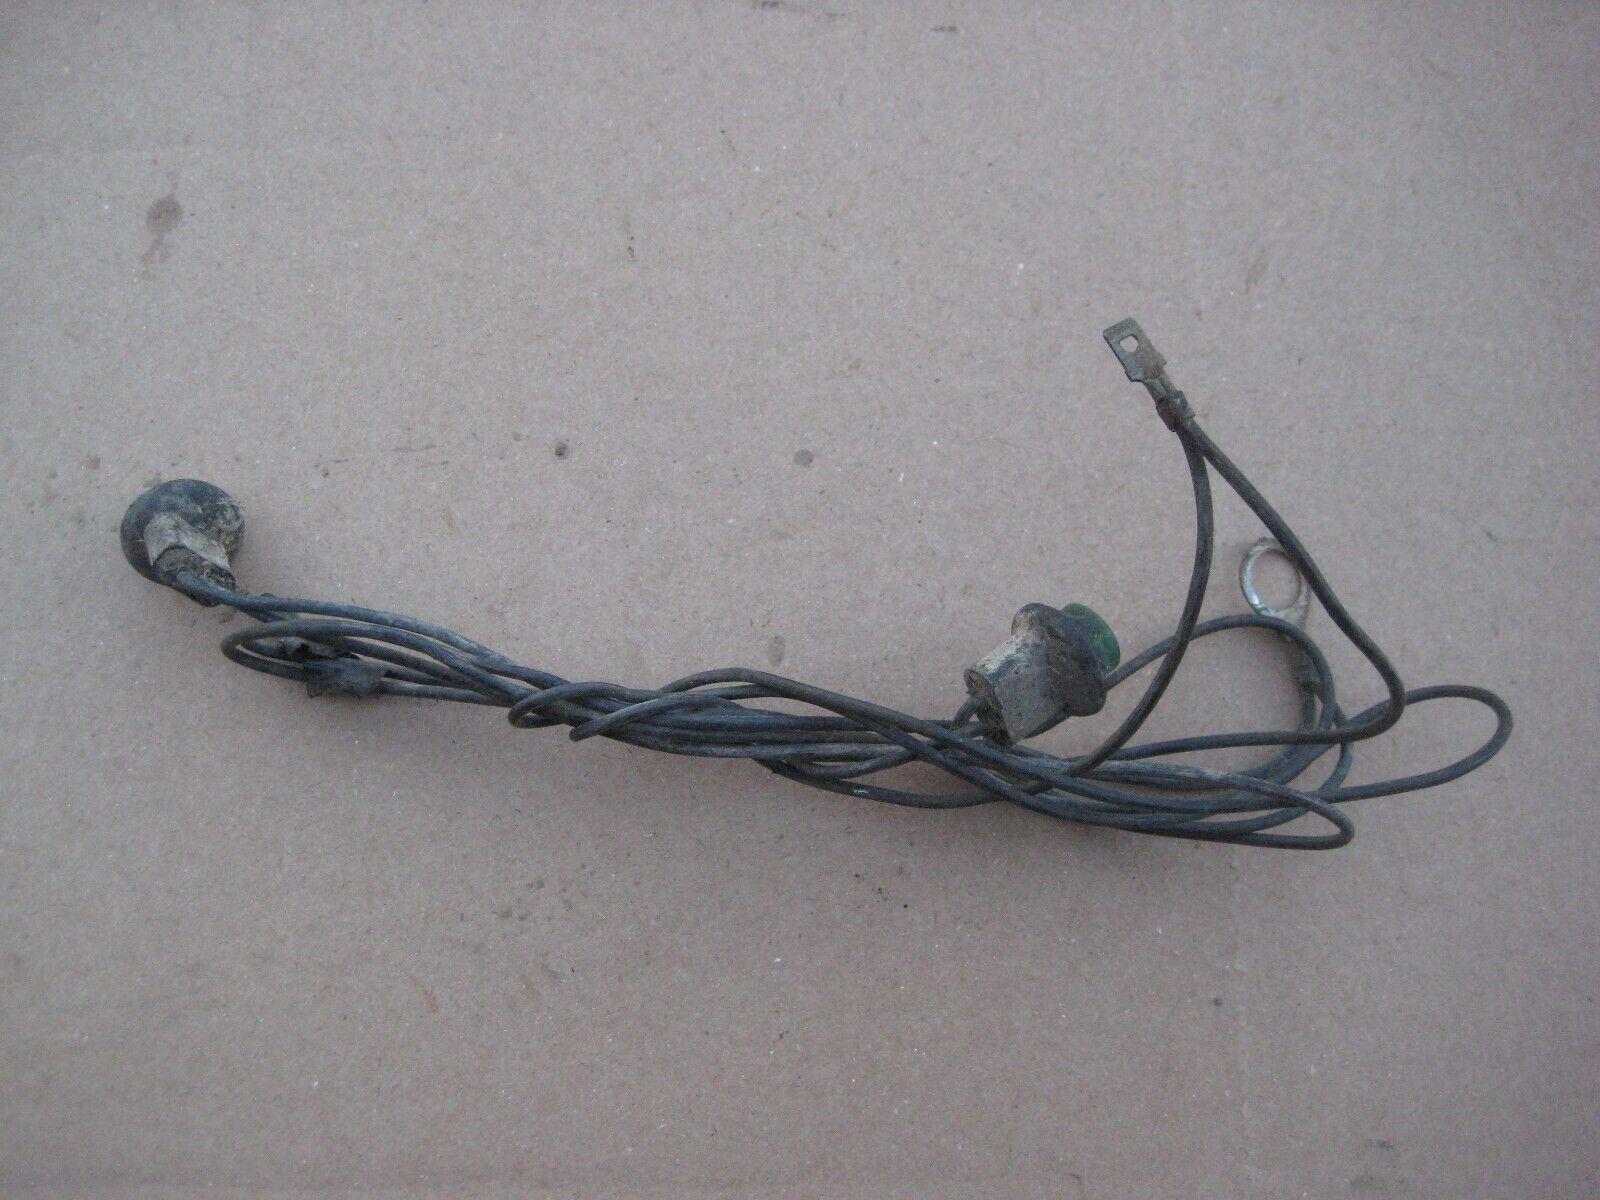 John Deere lawn garden tractor 210 212 214 216 headlight wiring harness  bulbs for sale online | eBayeBay